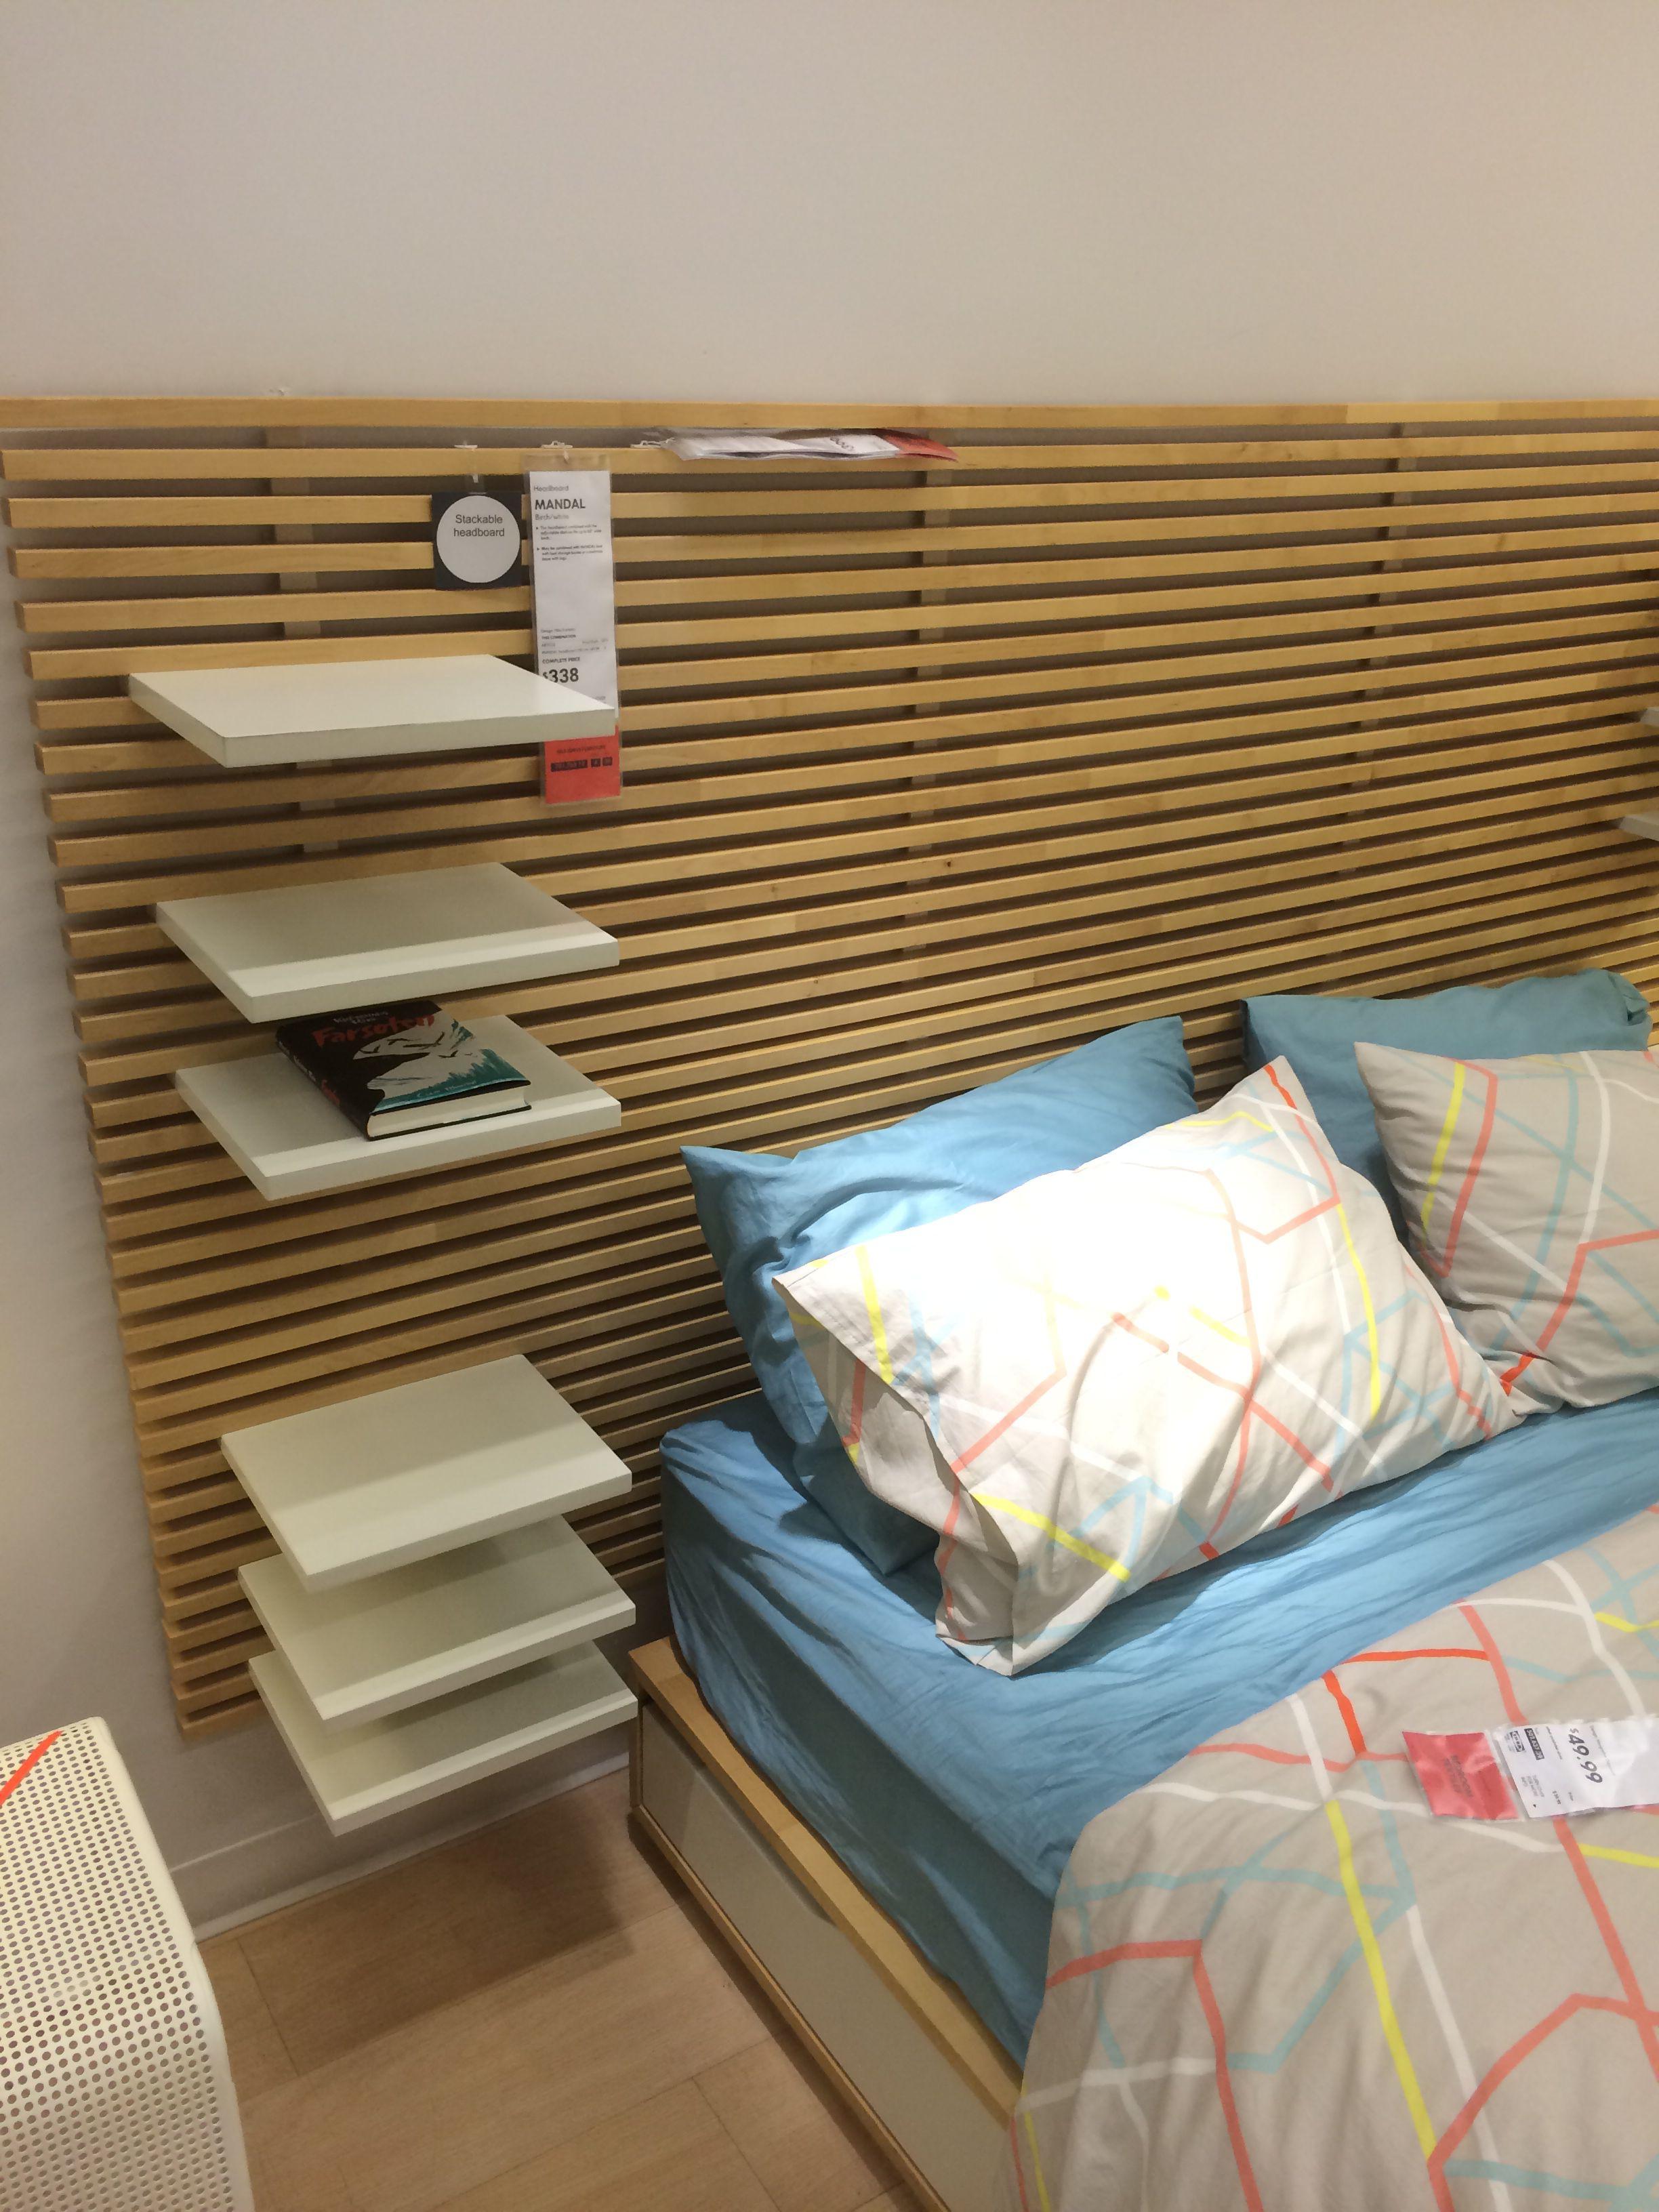 Ikea Mandal Headboard And Adjustable Shelves Ikea Mandal Headboard Headboard With Shelves Home Decor Bedroom